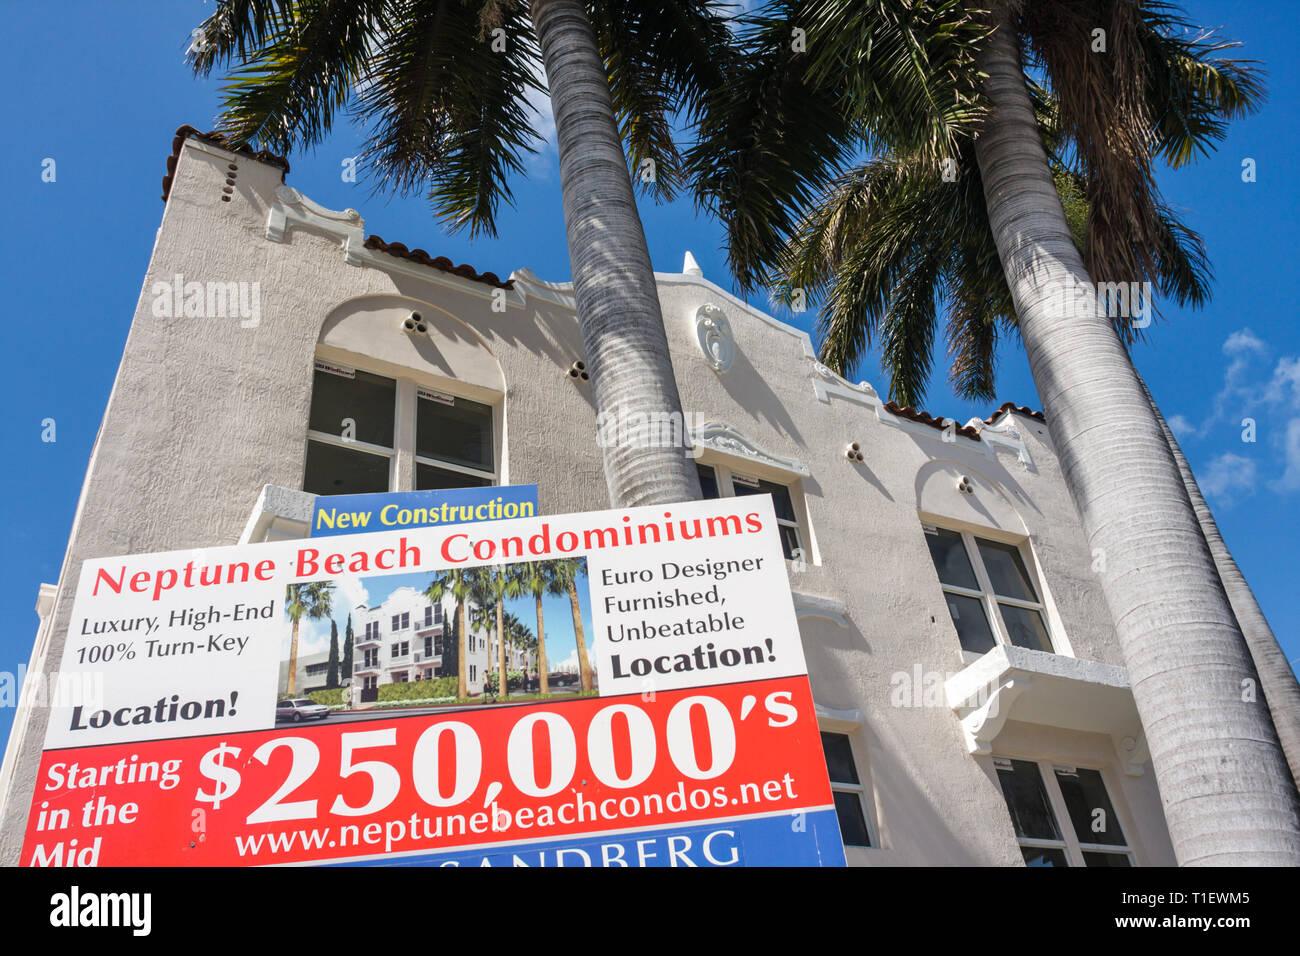 Miami Beach Florida Neptune Beach Condominiums building refurbished condo condominium conversion royal palm trees real estate sa - Stock Image